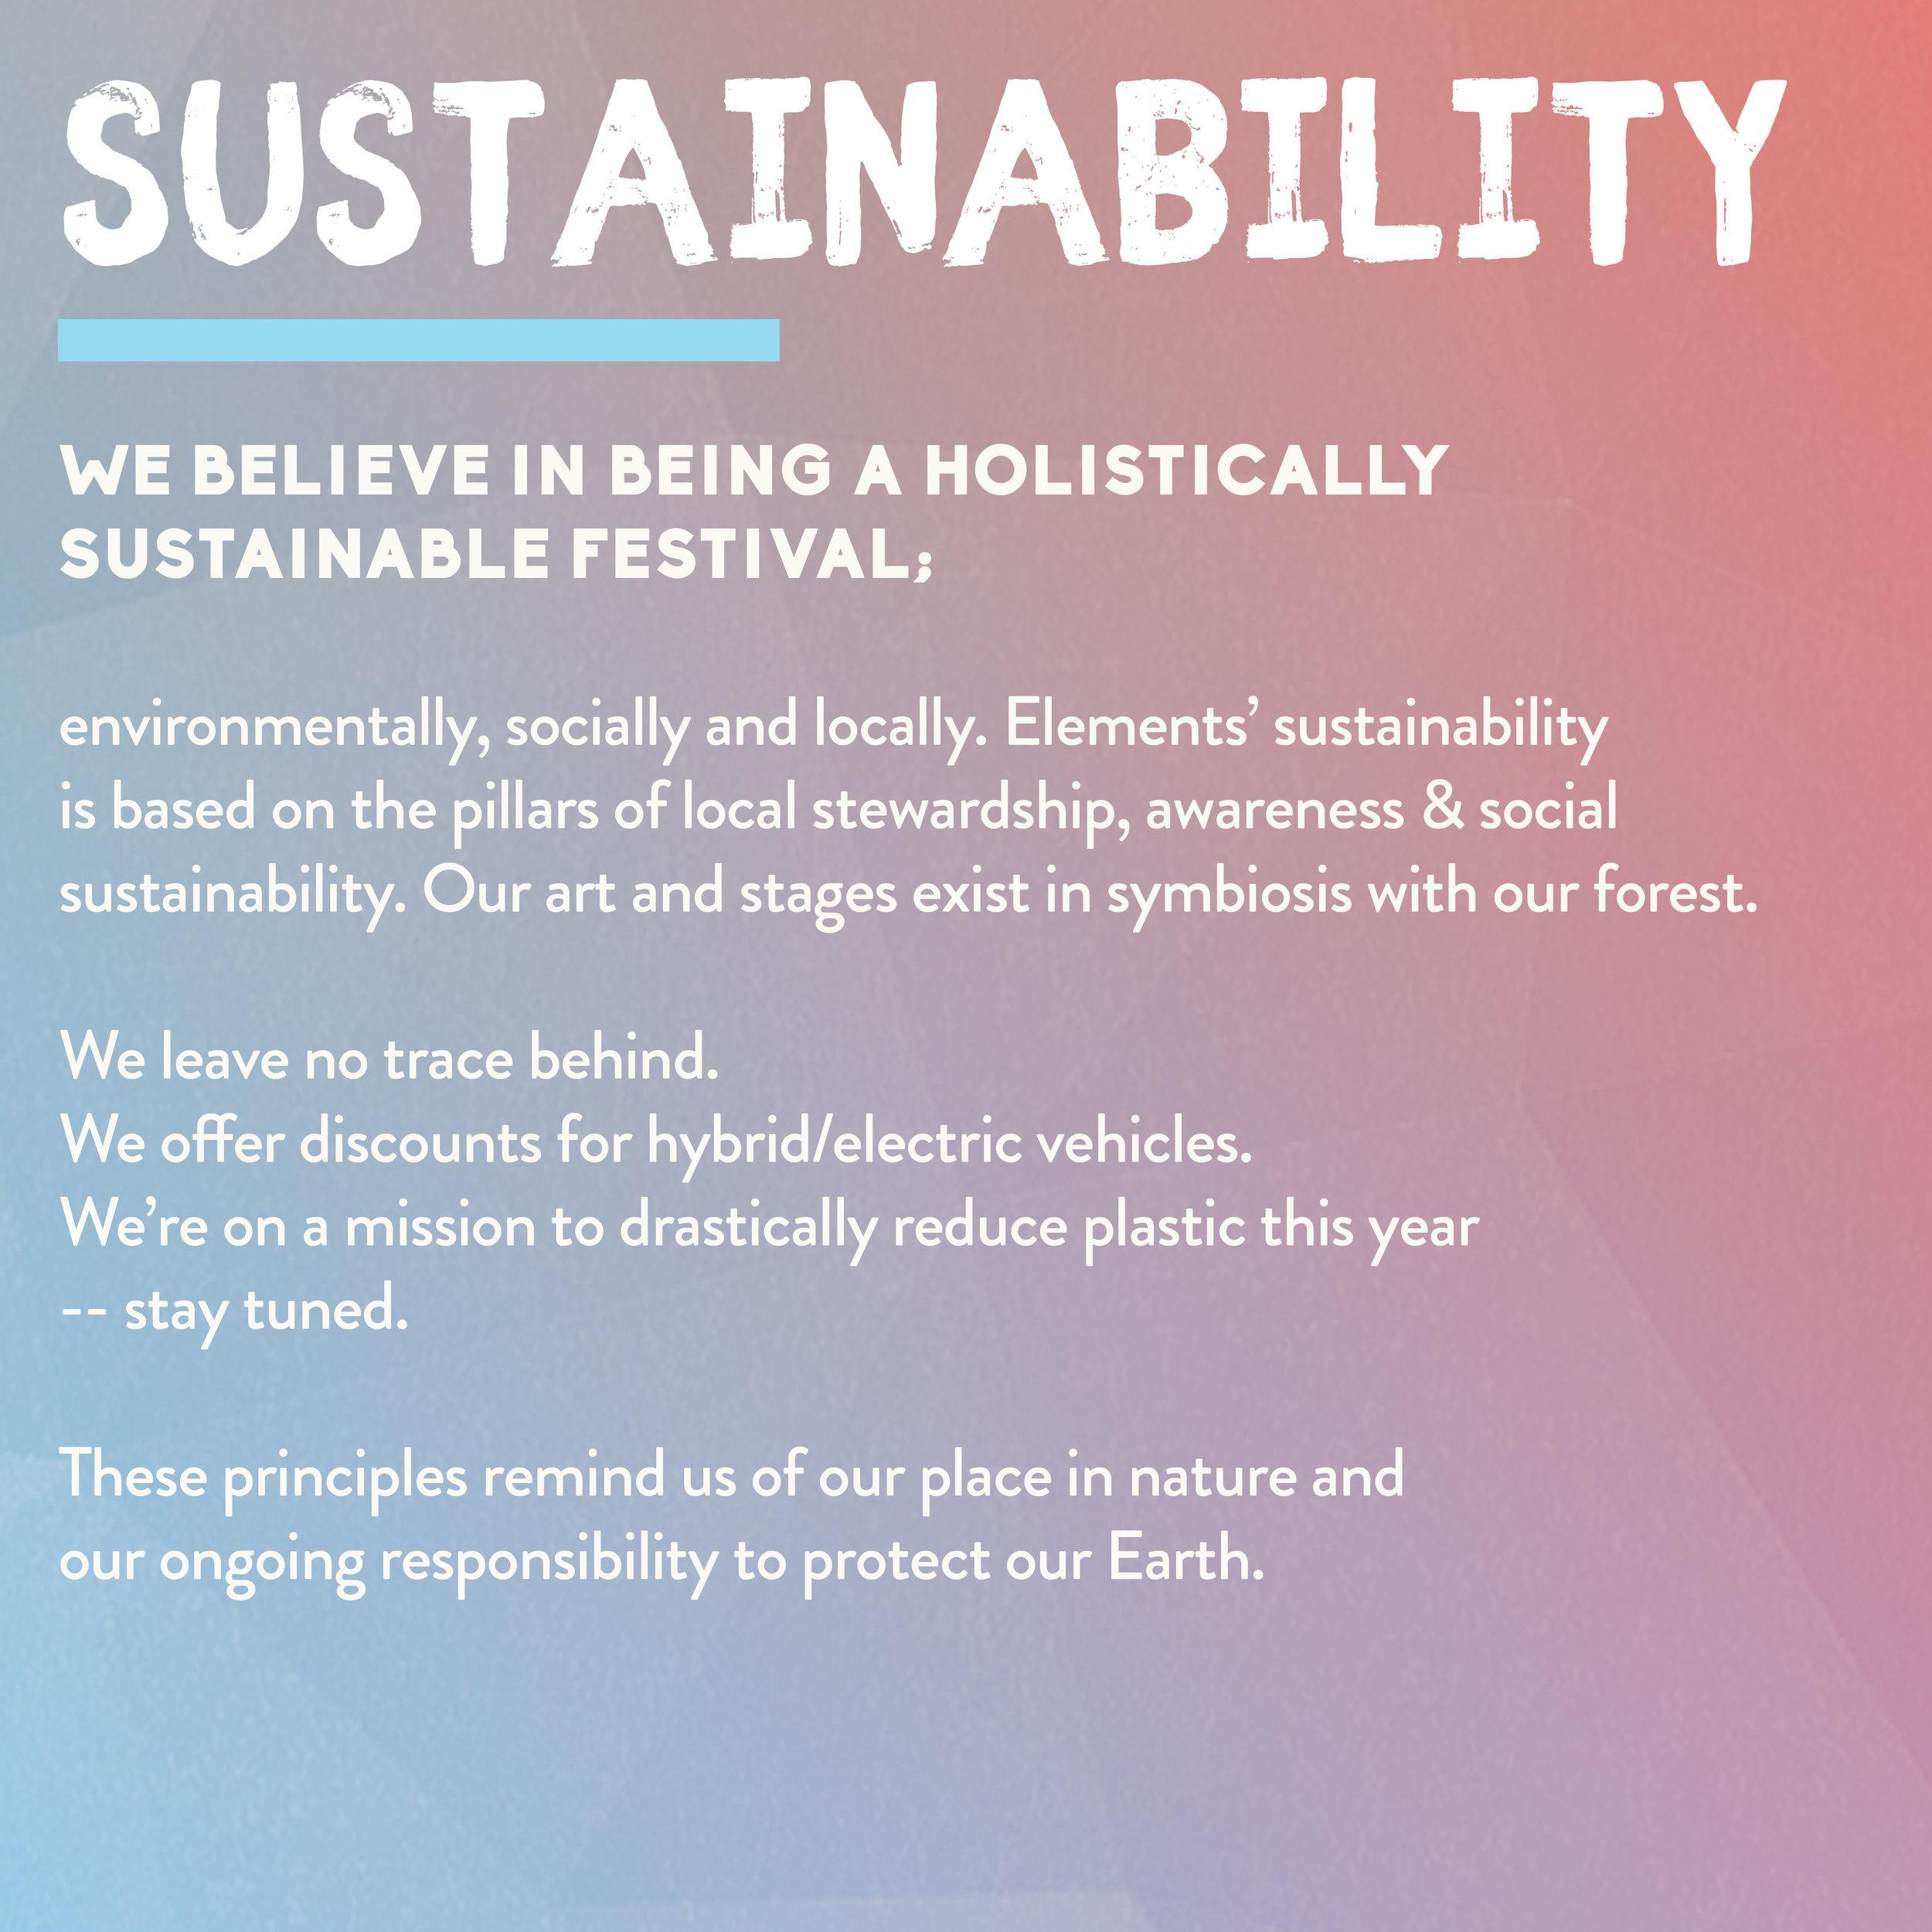 EXPERIENCE_Activities - 04.22.19 - sustainability.jpg